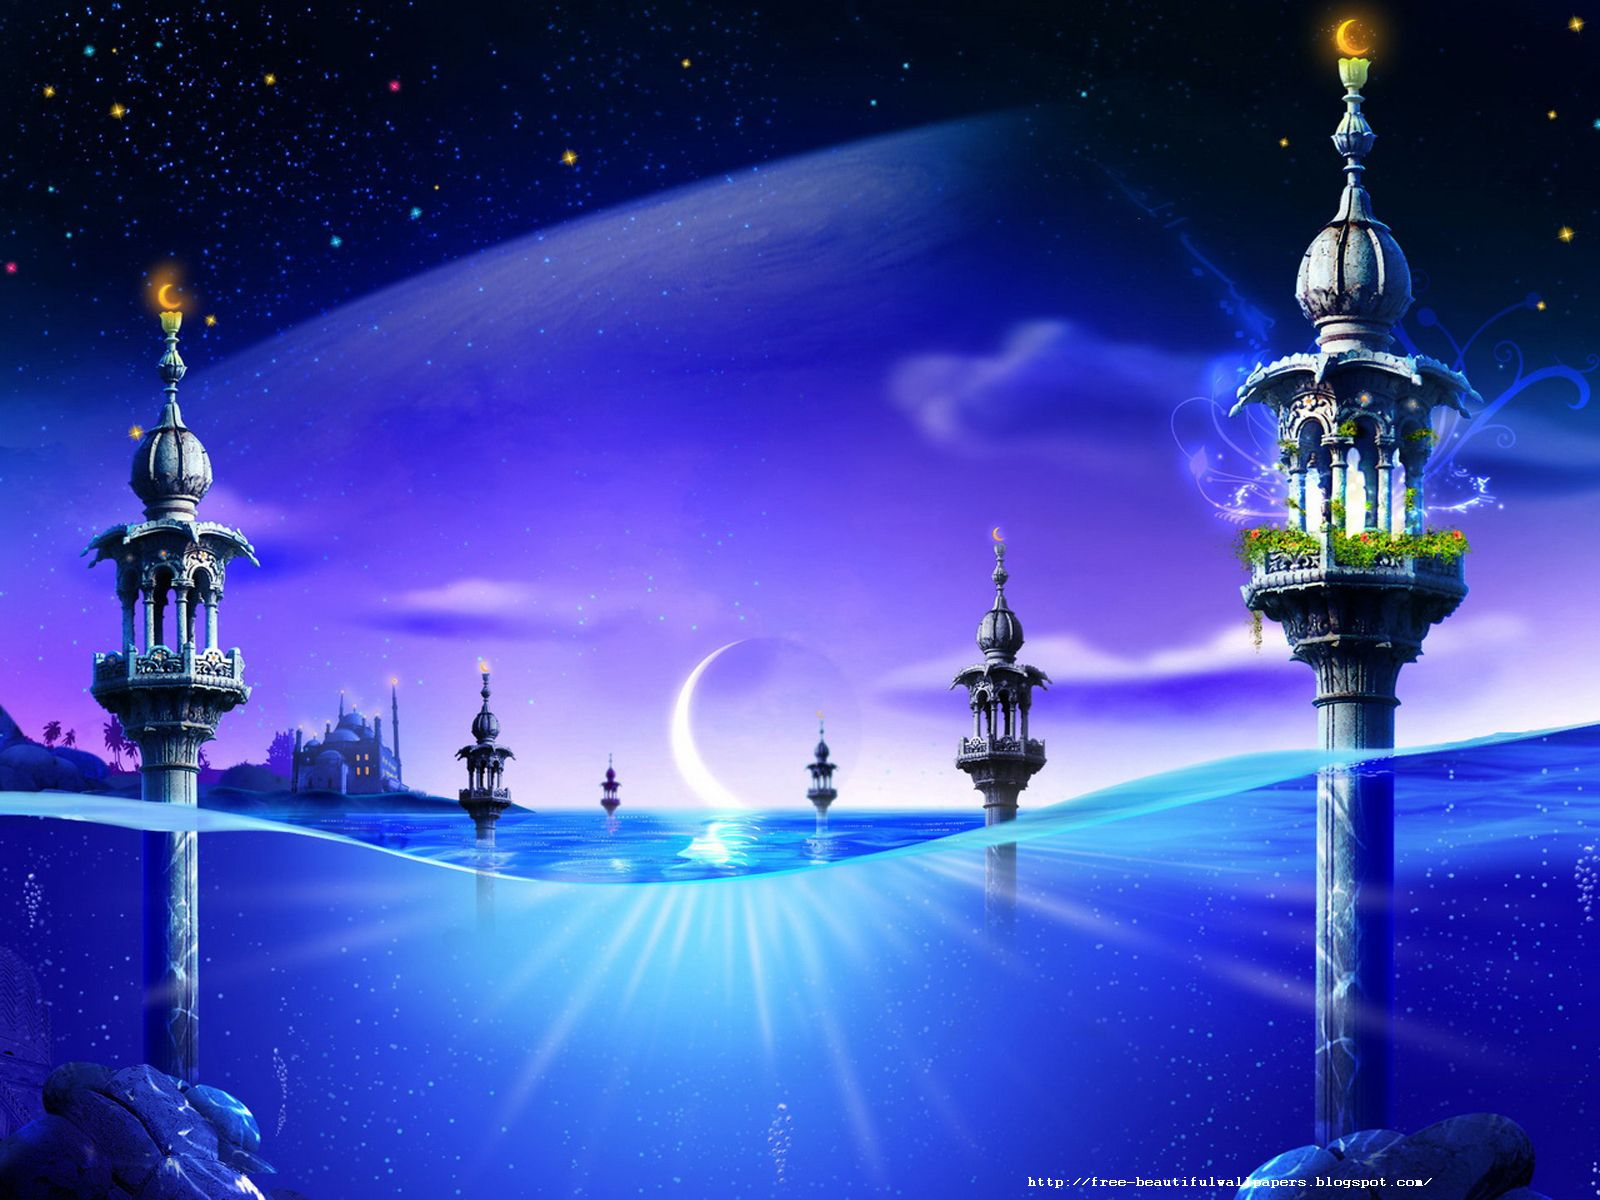 Free Beautiful Wallpapers Download: Islamic Beautiful